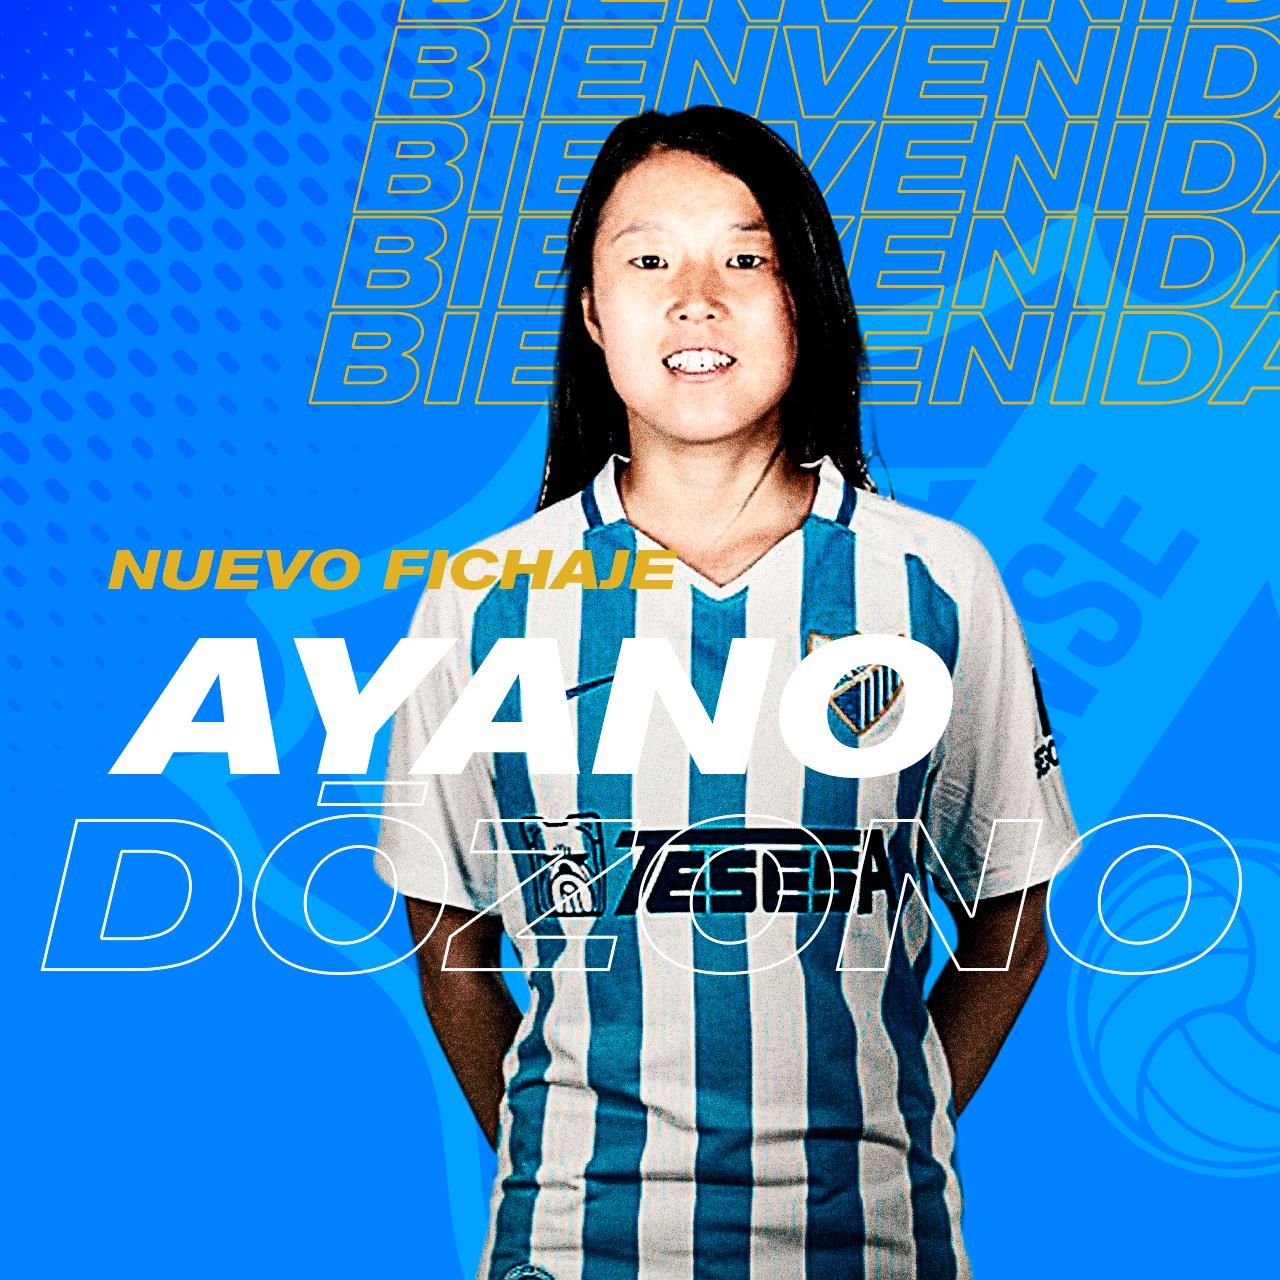 Nuevo Fichaje Ayano Dōzono